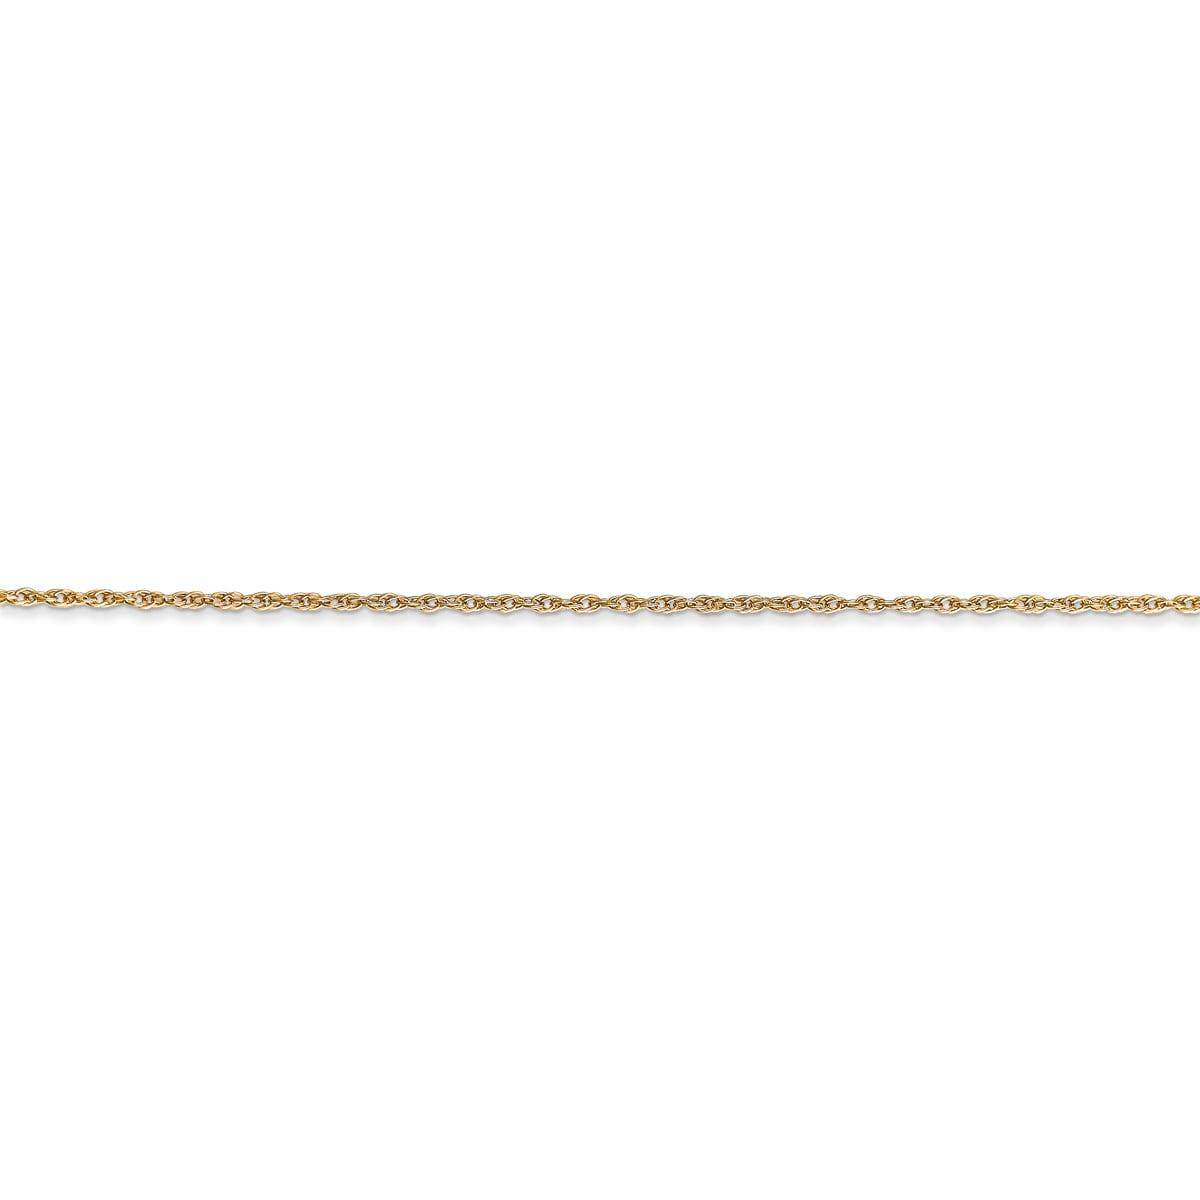 Versil 14k Yellow Gold 0.8mm Light-baby Rope Chain Neckla...